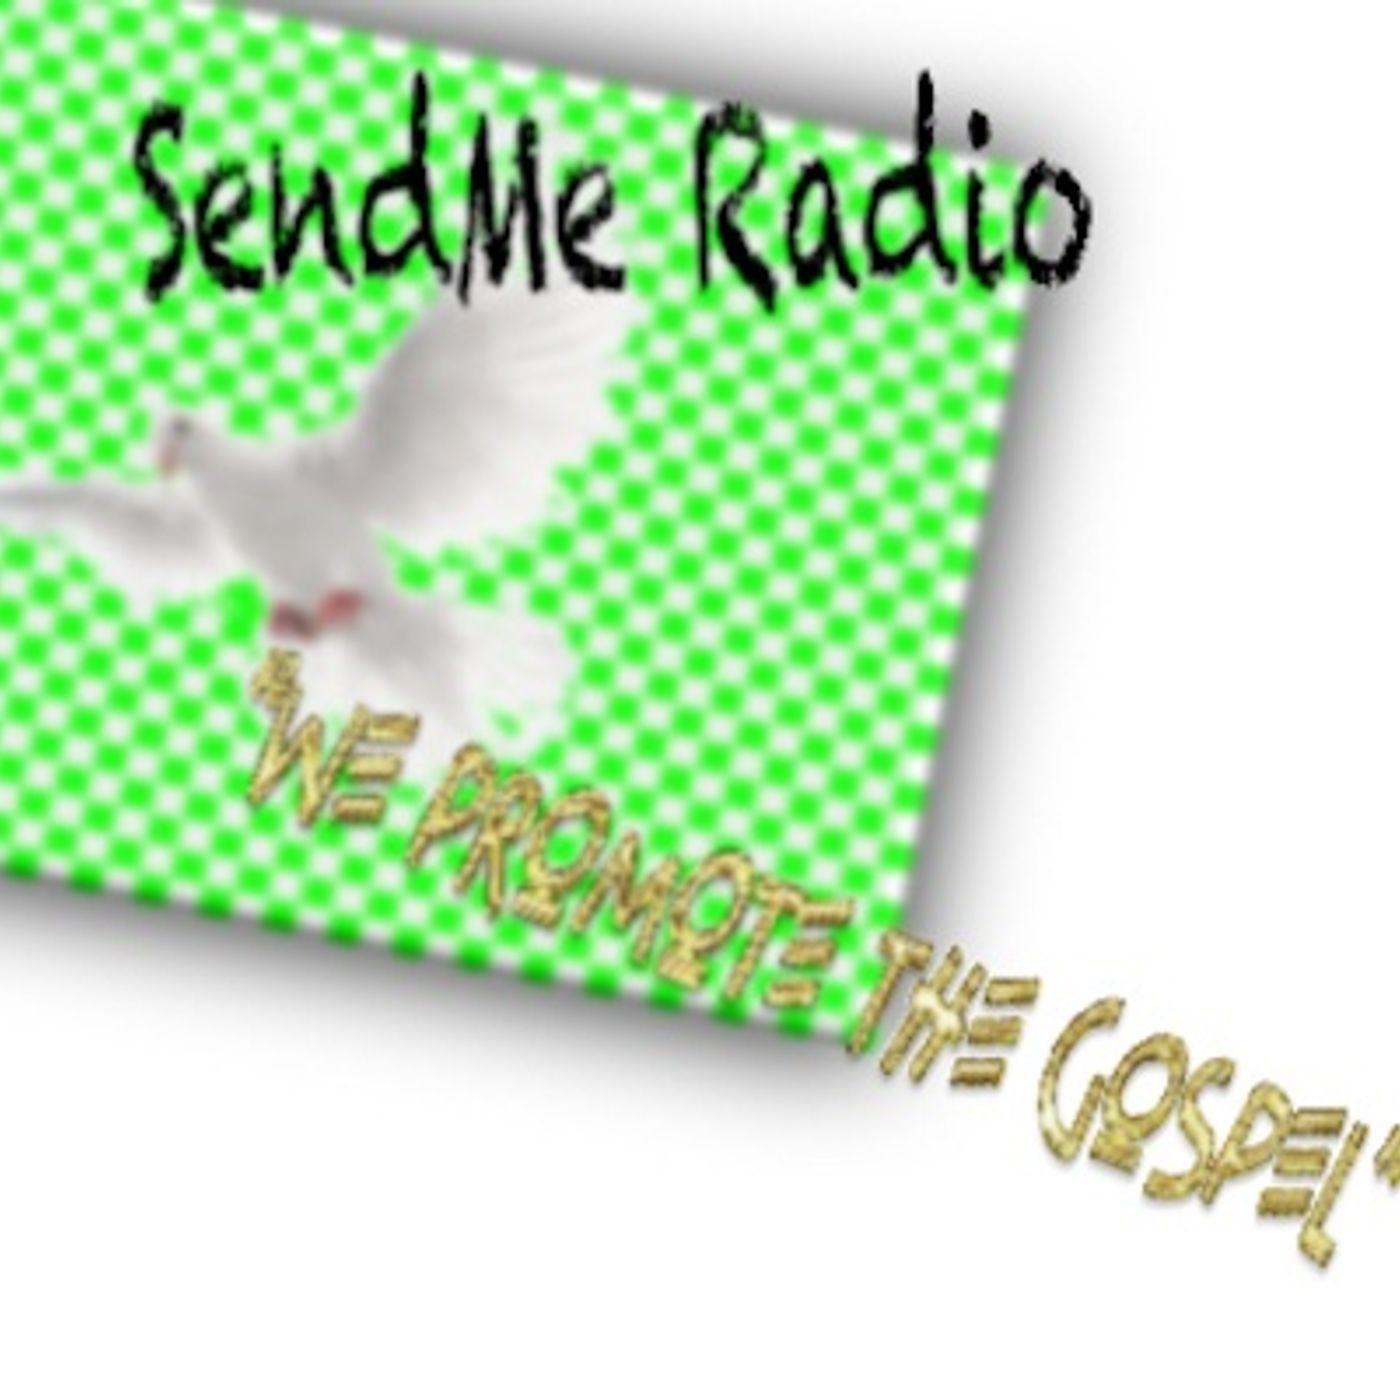 Psalms 116 Pastor Chidi Okorie Episode 348 - SendMe Radio